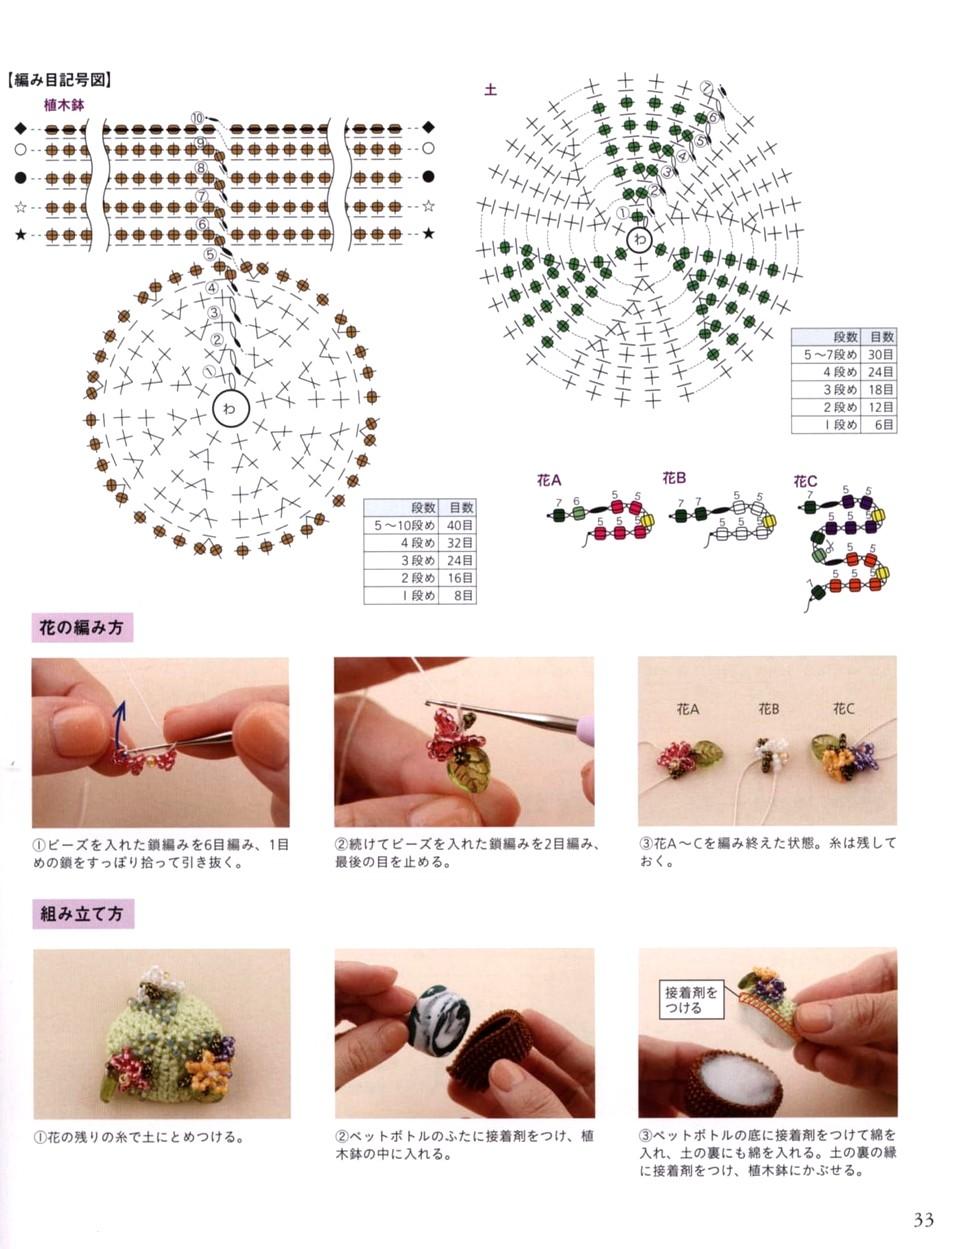 717 Beads Crochet 17-34